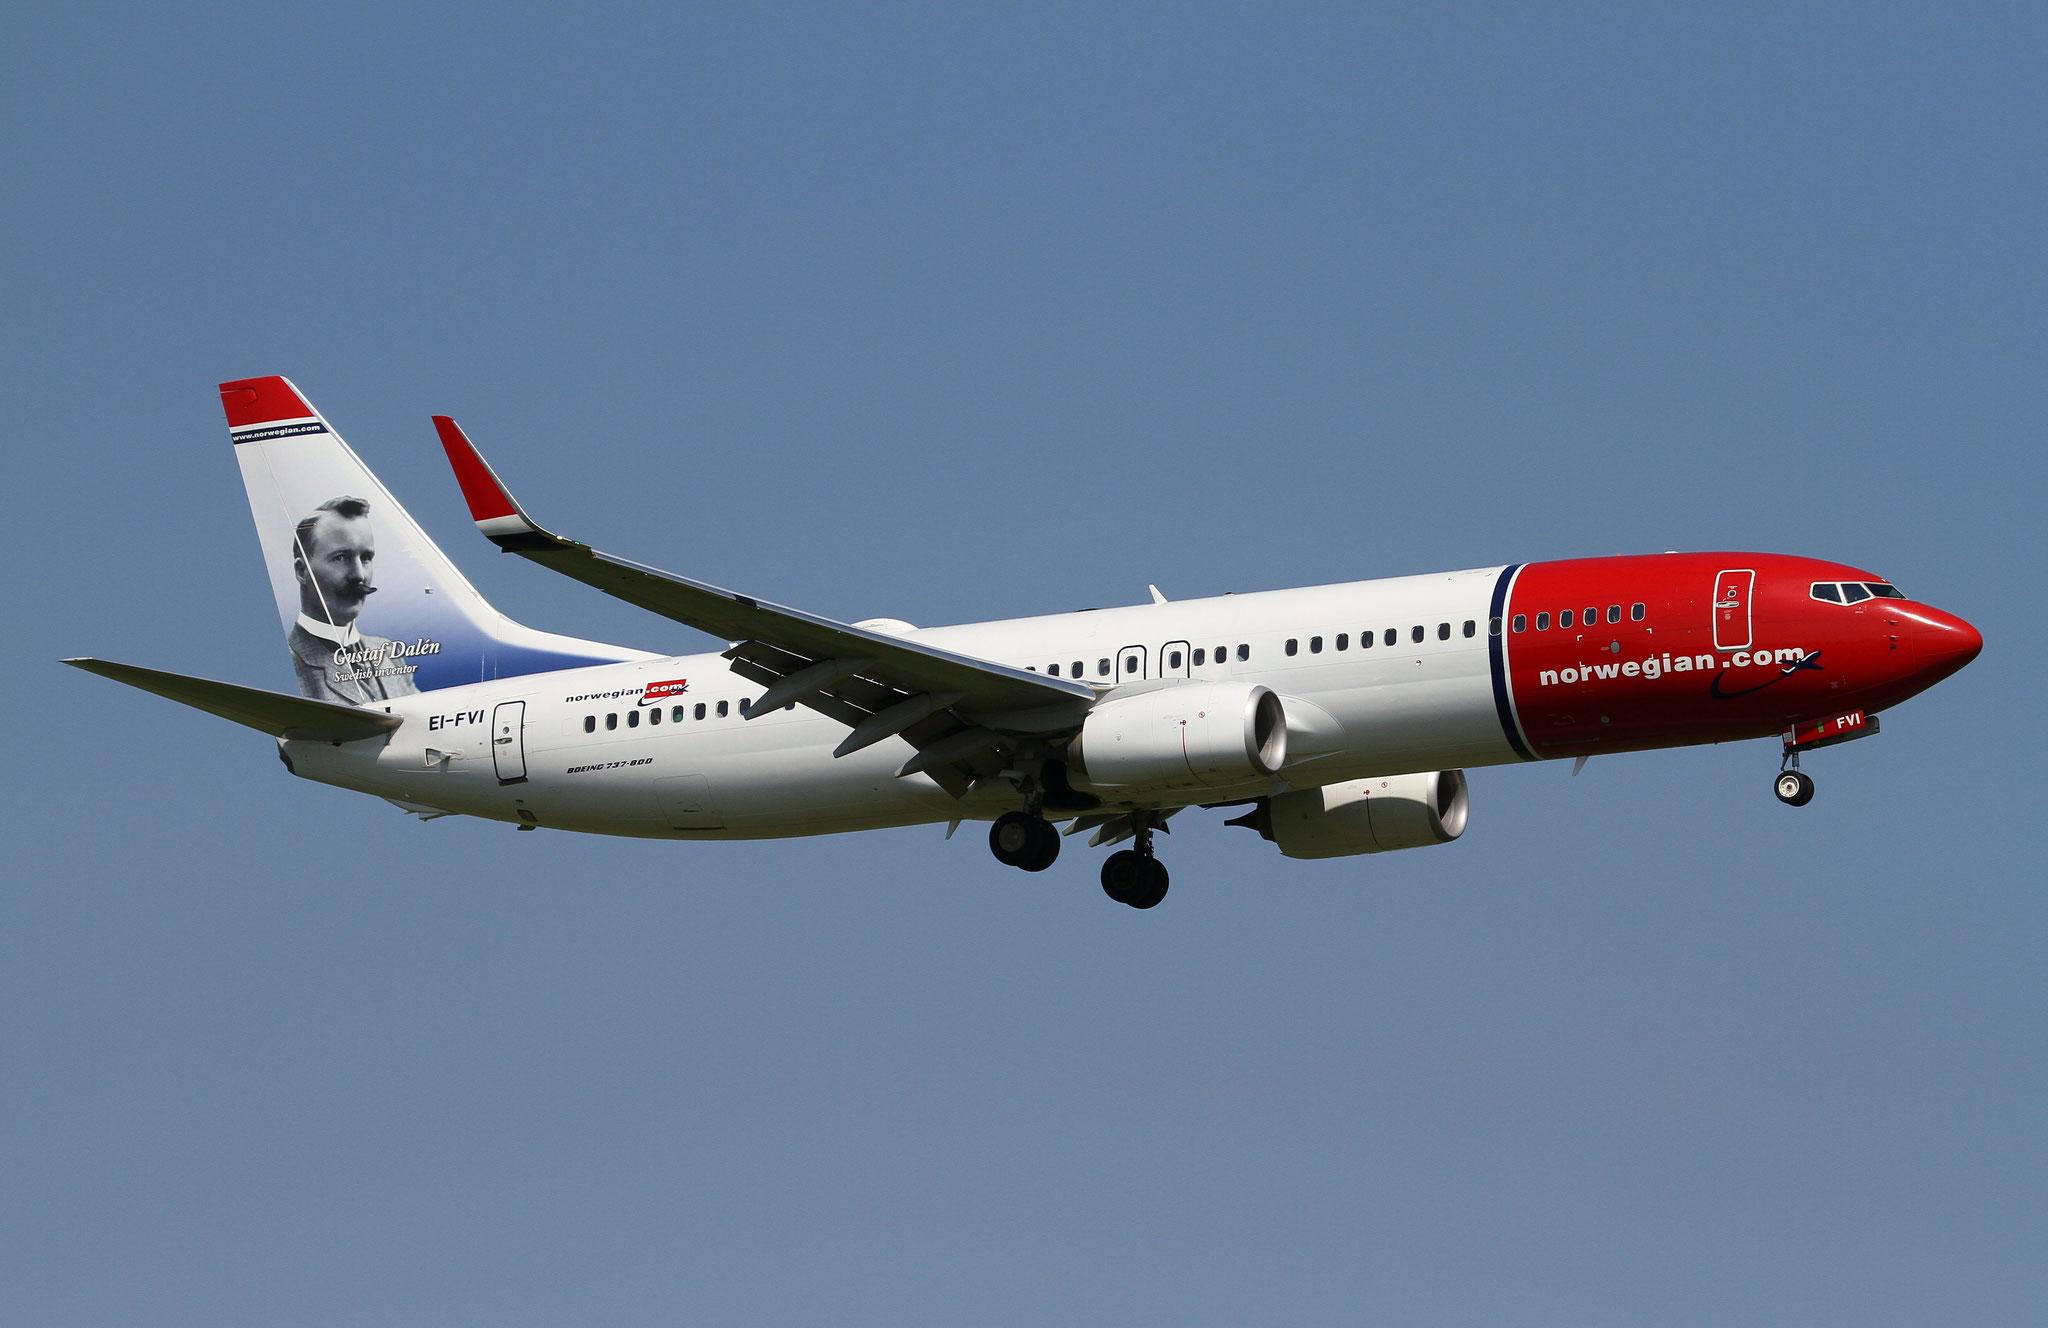 EI-FVI B737-800 42274/6247 Norwegian